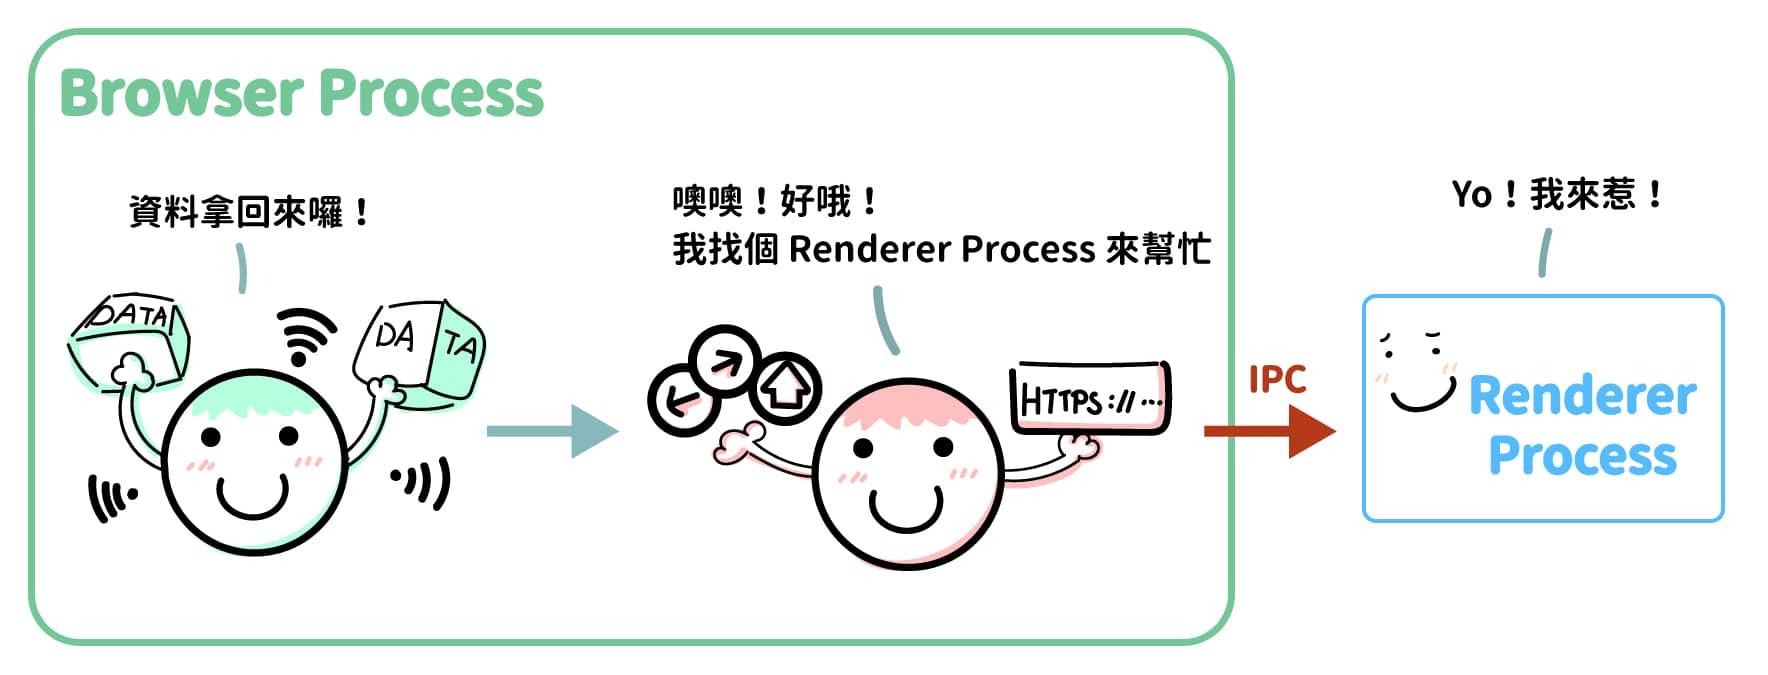 Browser Process 就會透過 IPC 的方式通知 Renderer Process 執行 Navigation